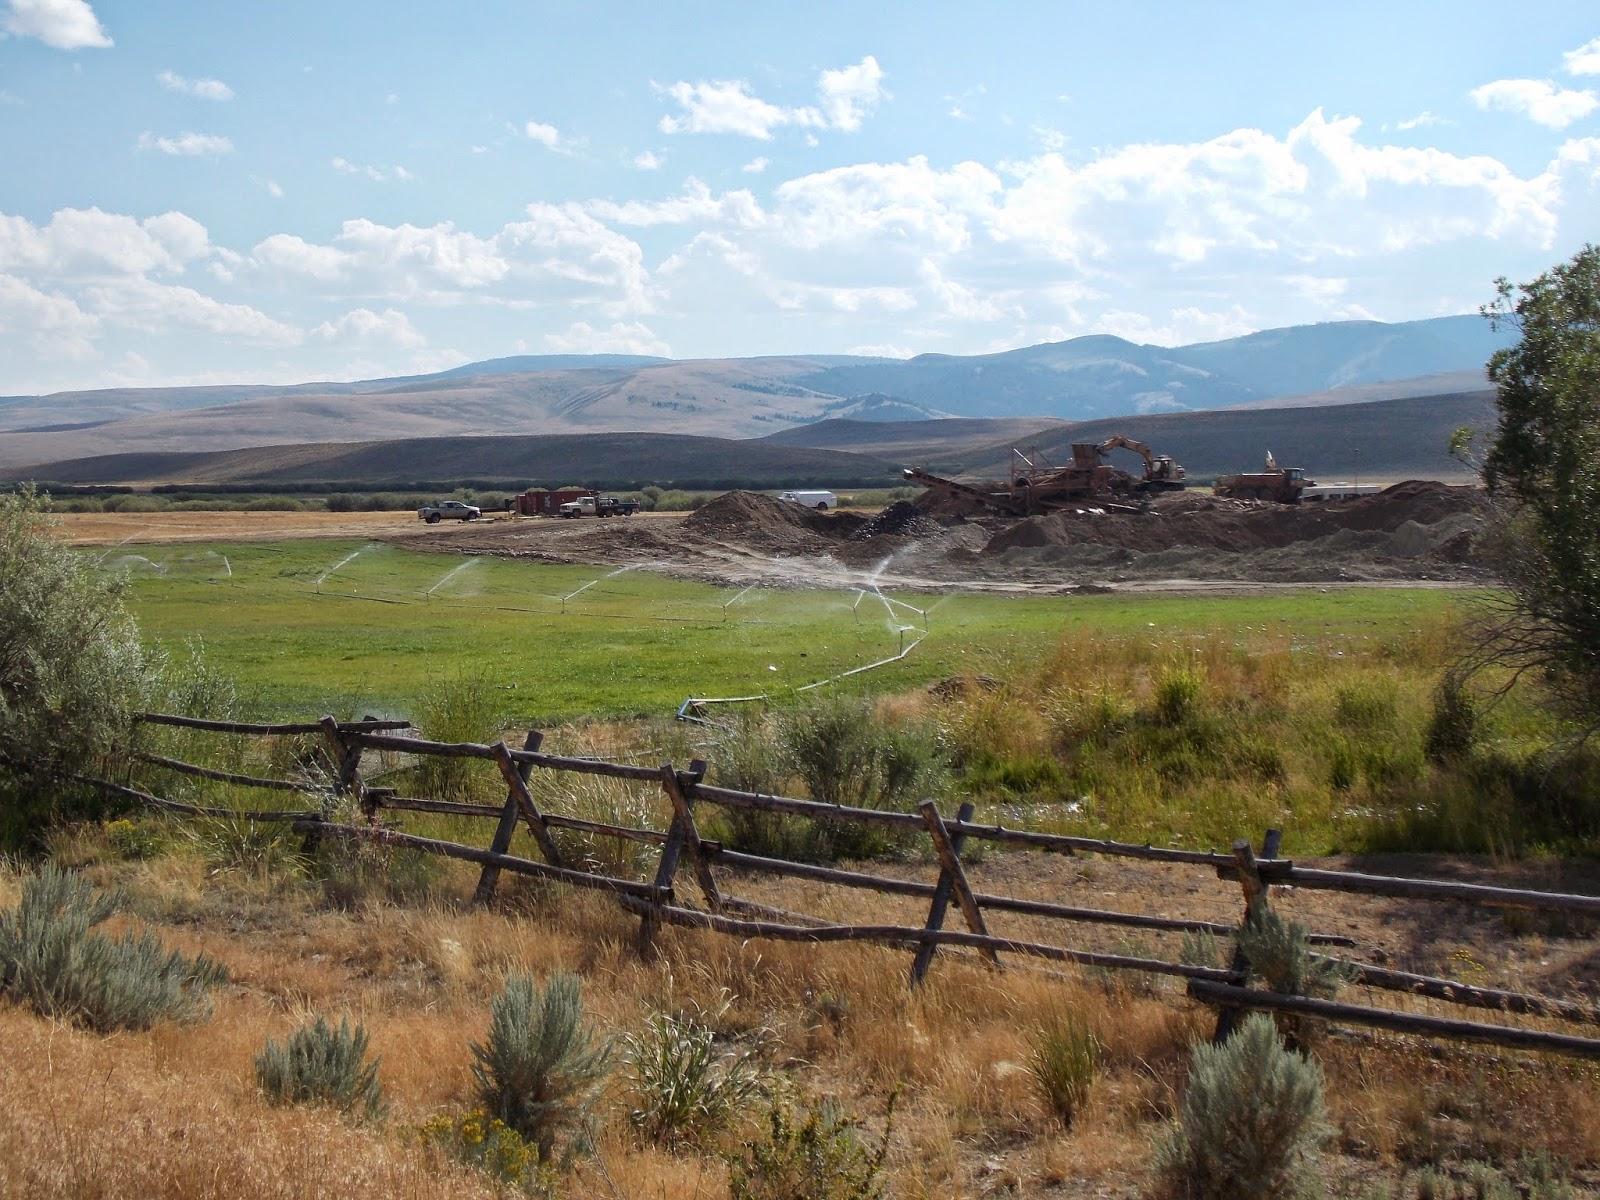 Mine site reclamation